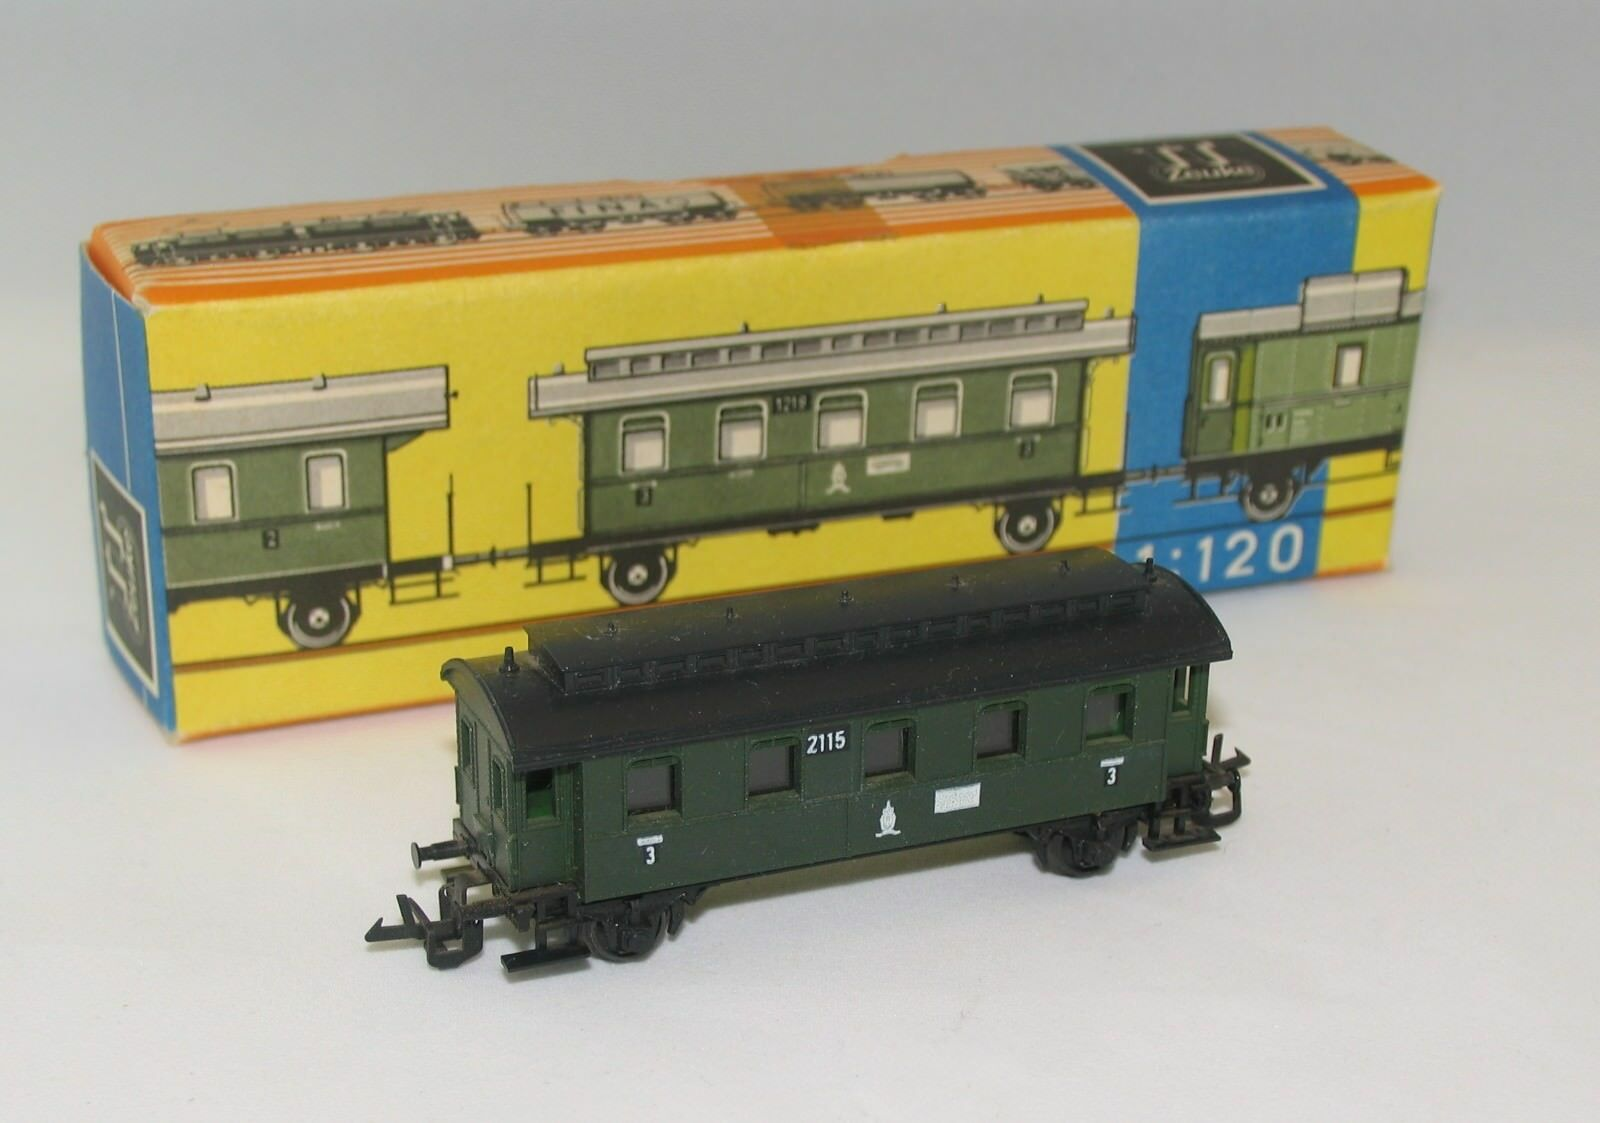 TT Zeuke Personenwagen green Wagon 2115 mit Orig. Karton Güterwagen Spur TT 1 120